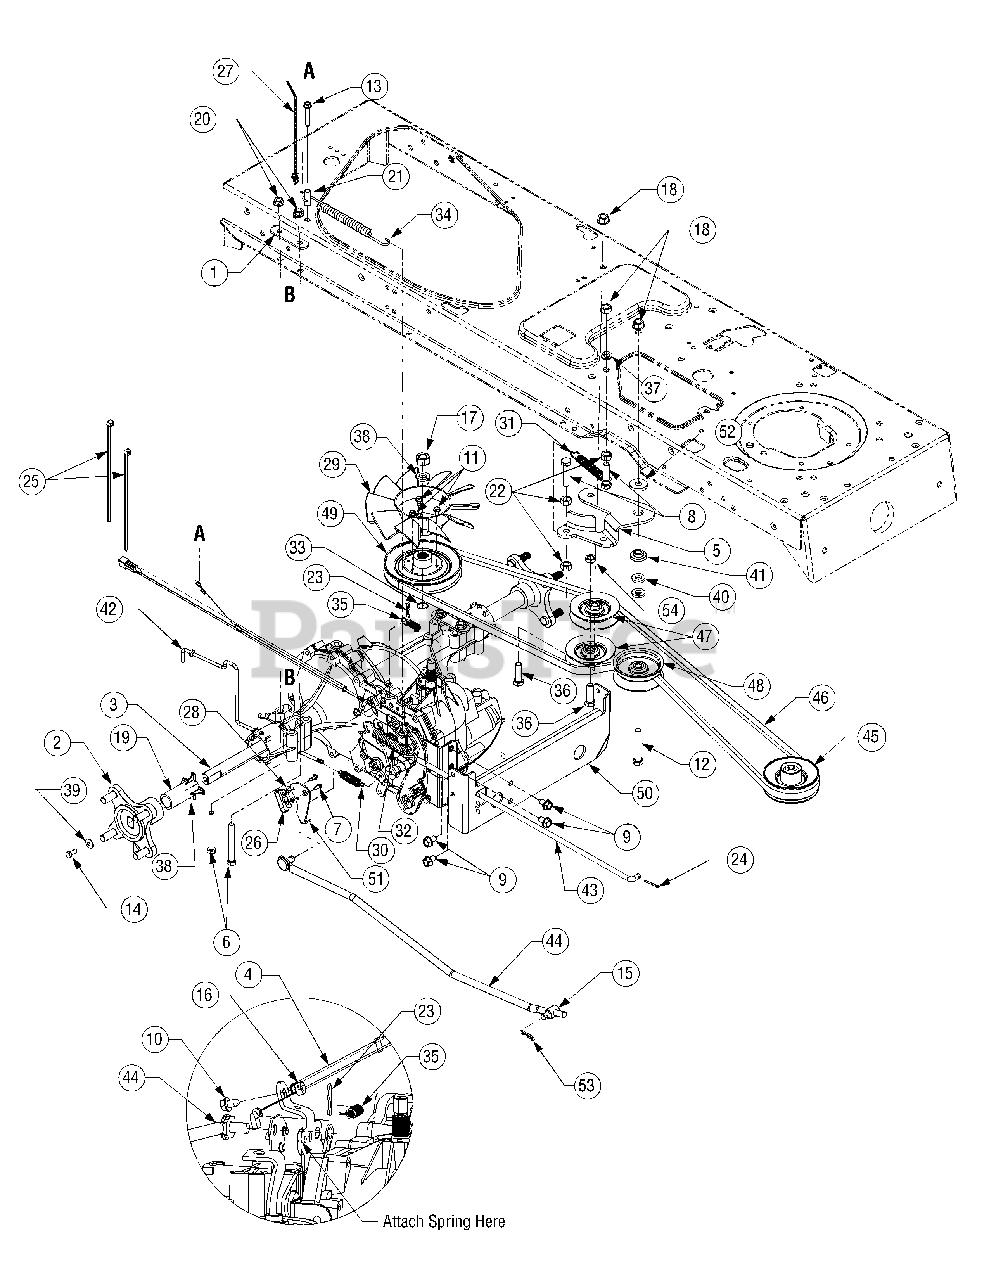 [DIAGRAM] Cub Cadet 122 Transmission Diagram FULL Version